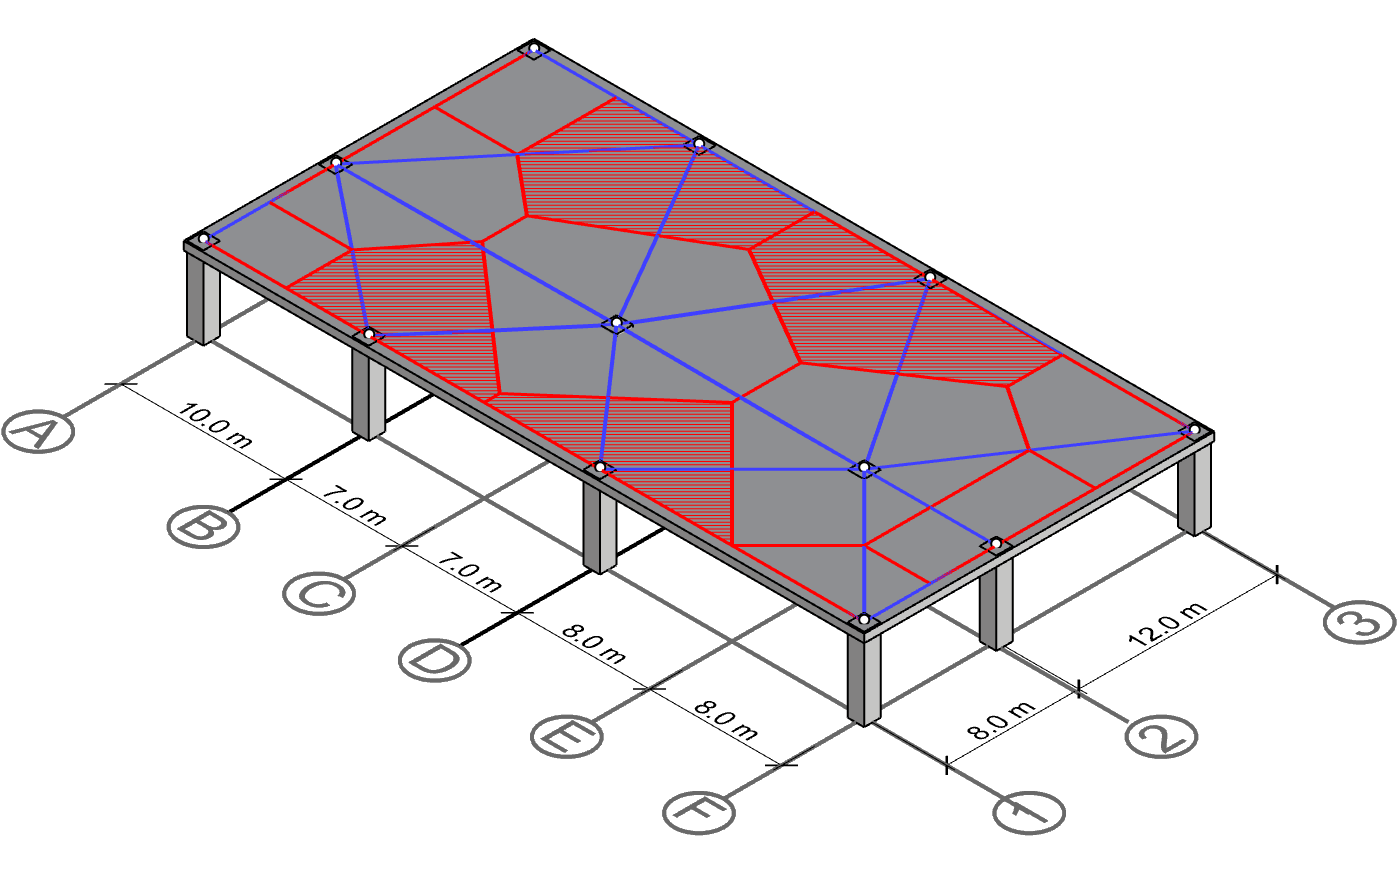 Derive centerline polygon for column B-1, B-3, D-1 and D-3